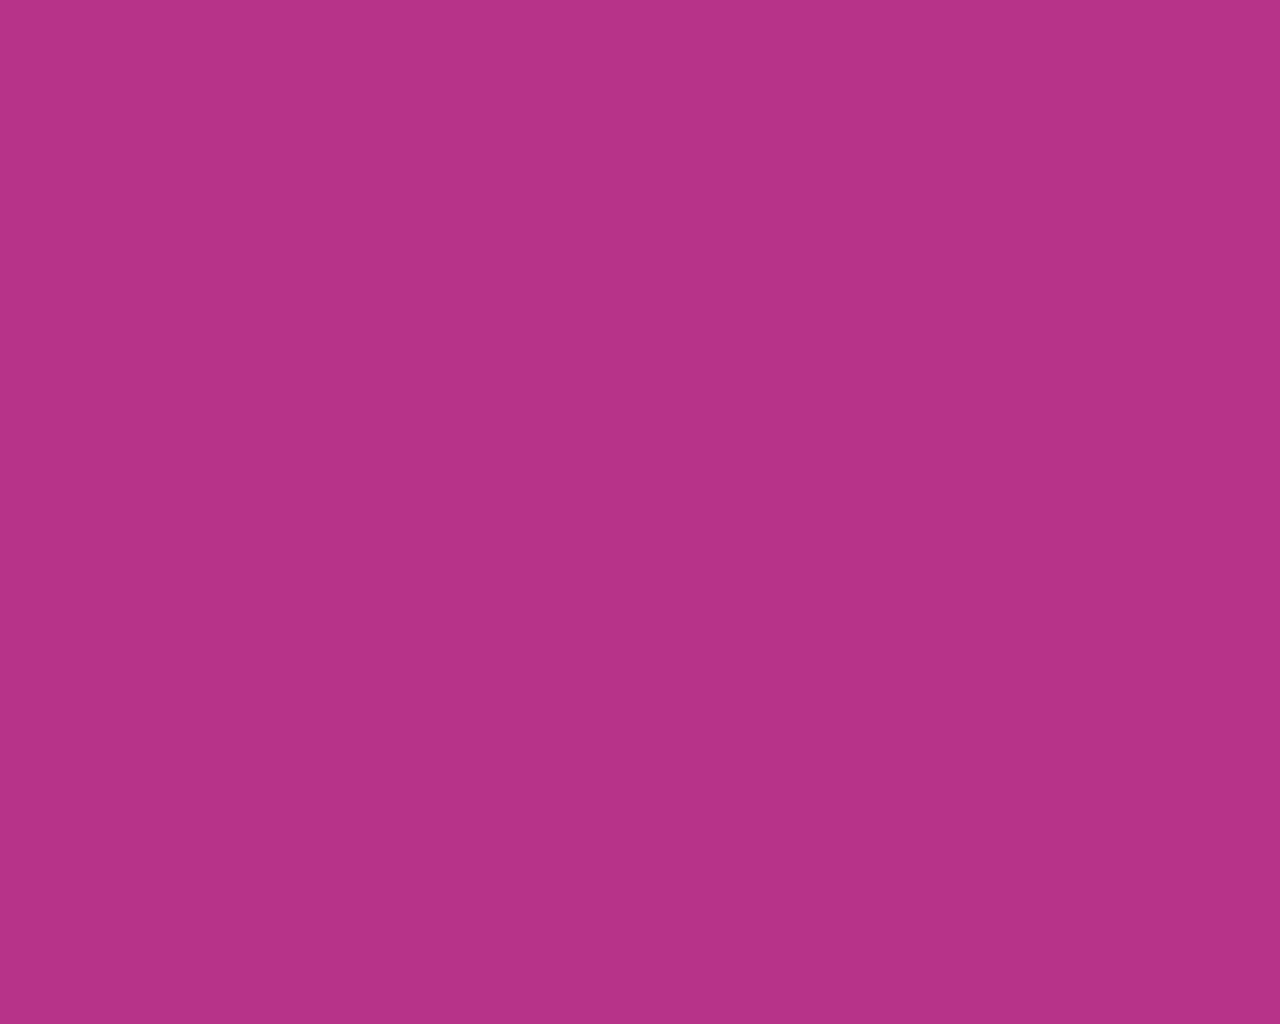 1280x1024 Fandango Solid Color Background